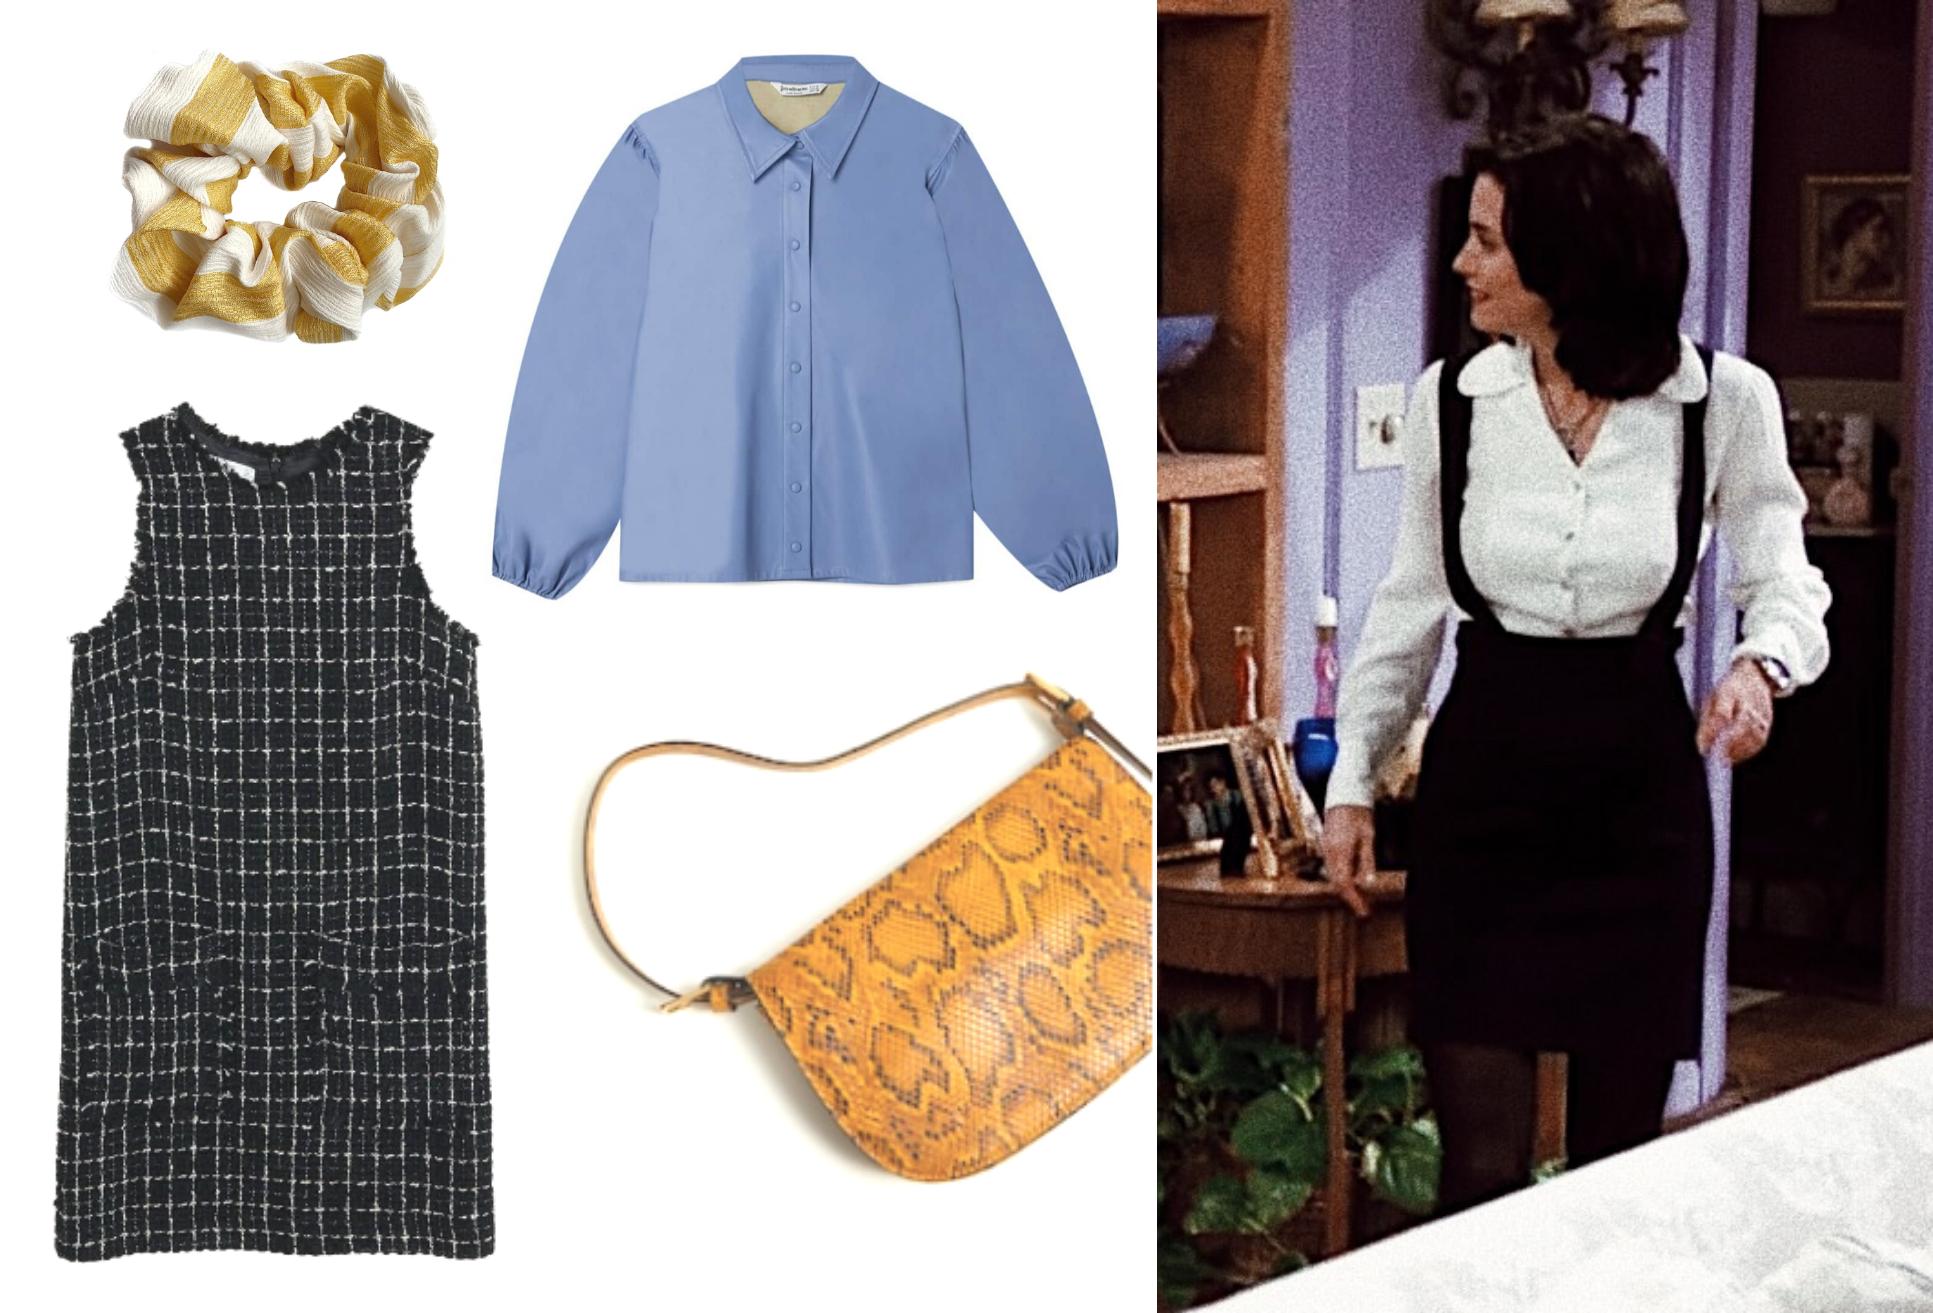 Monica, blå skjorte, taske, bag, kjole, hårpynt, inspiration, Friends. (Kollage: MY DAILY SPACE)